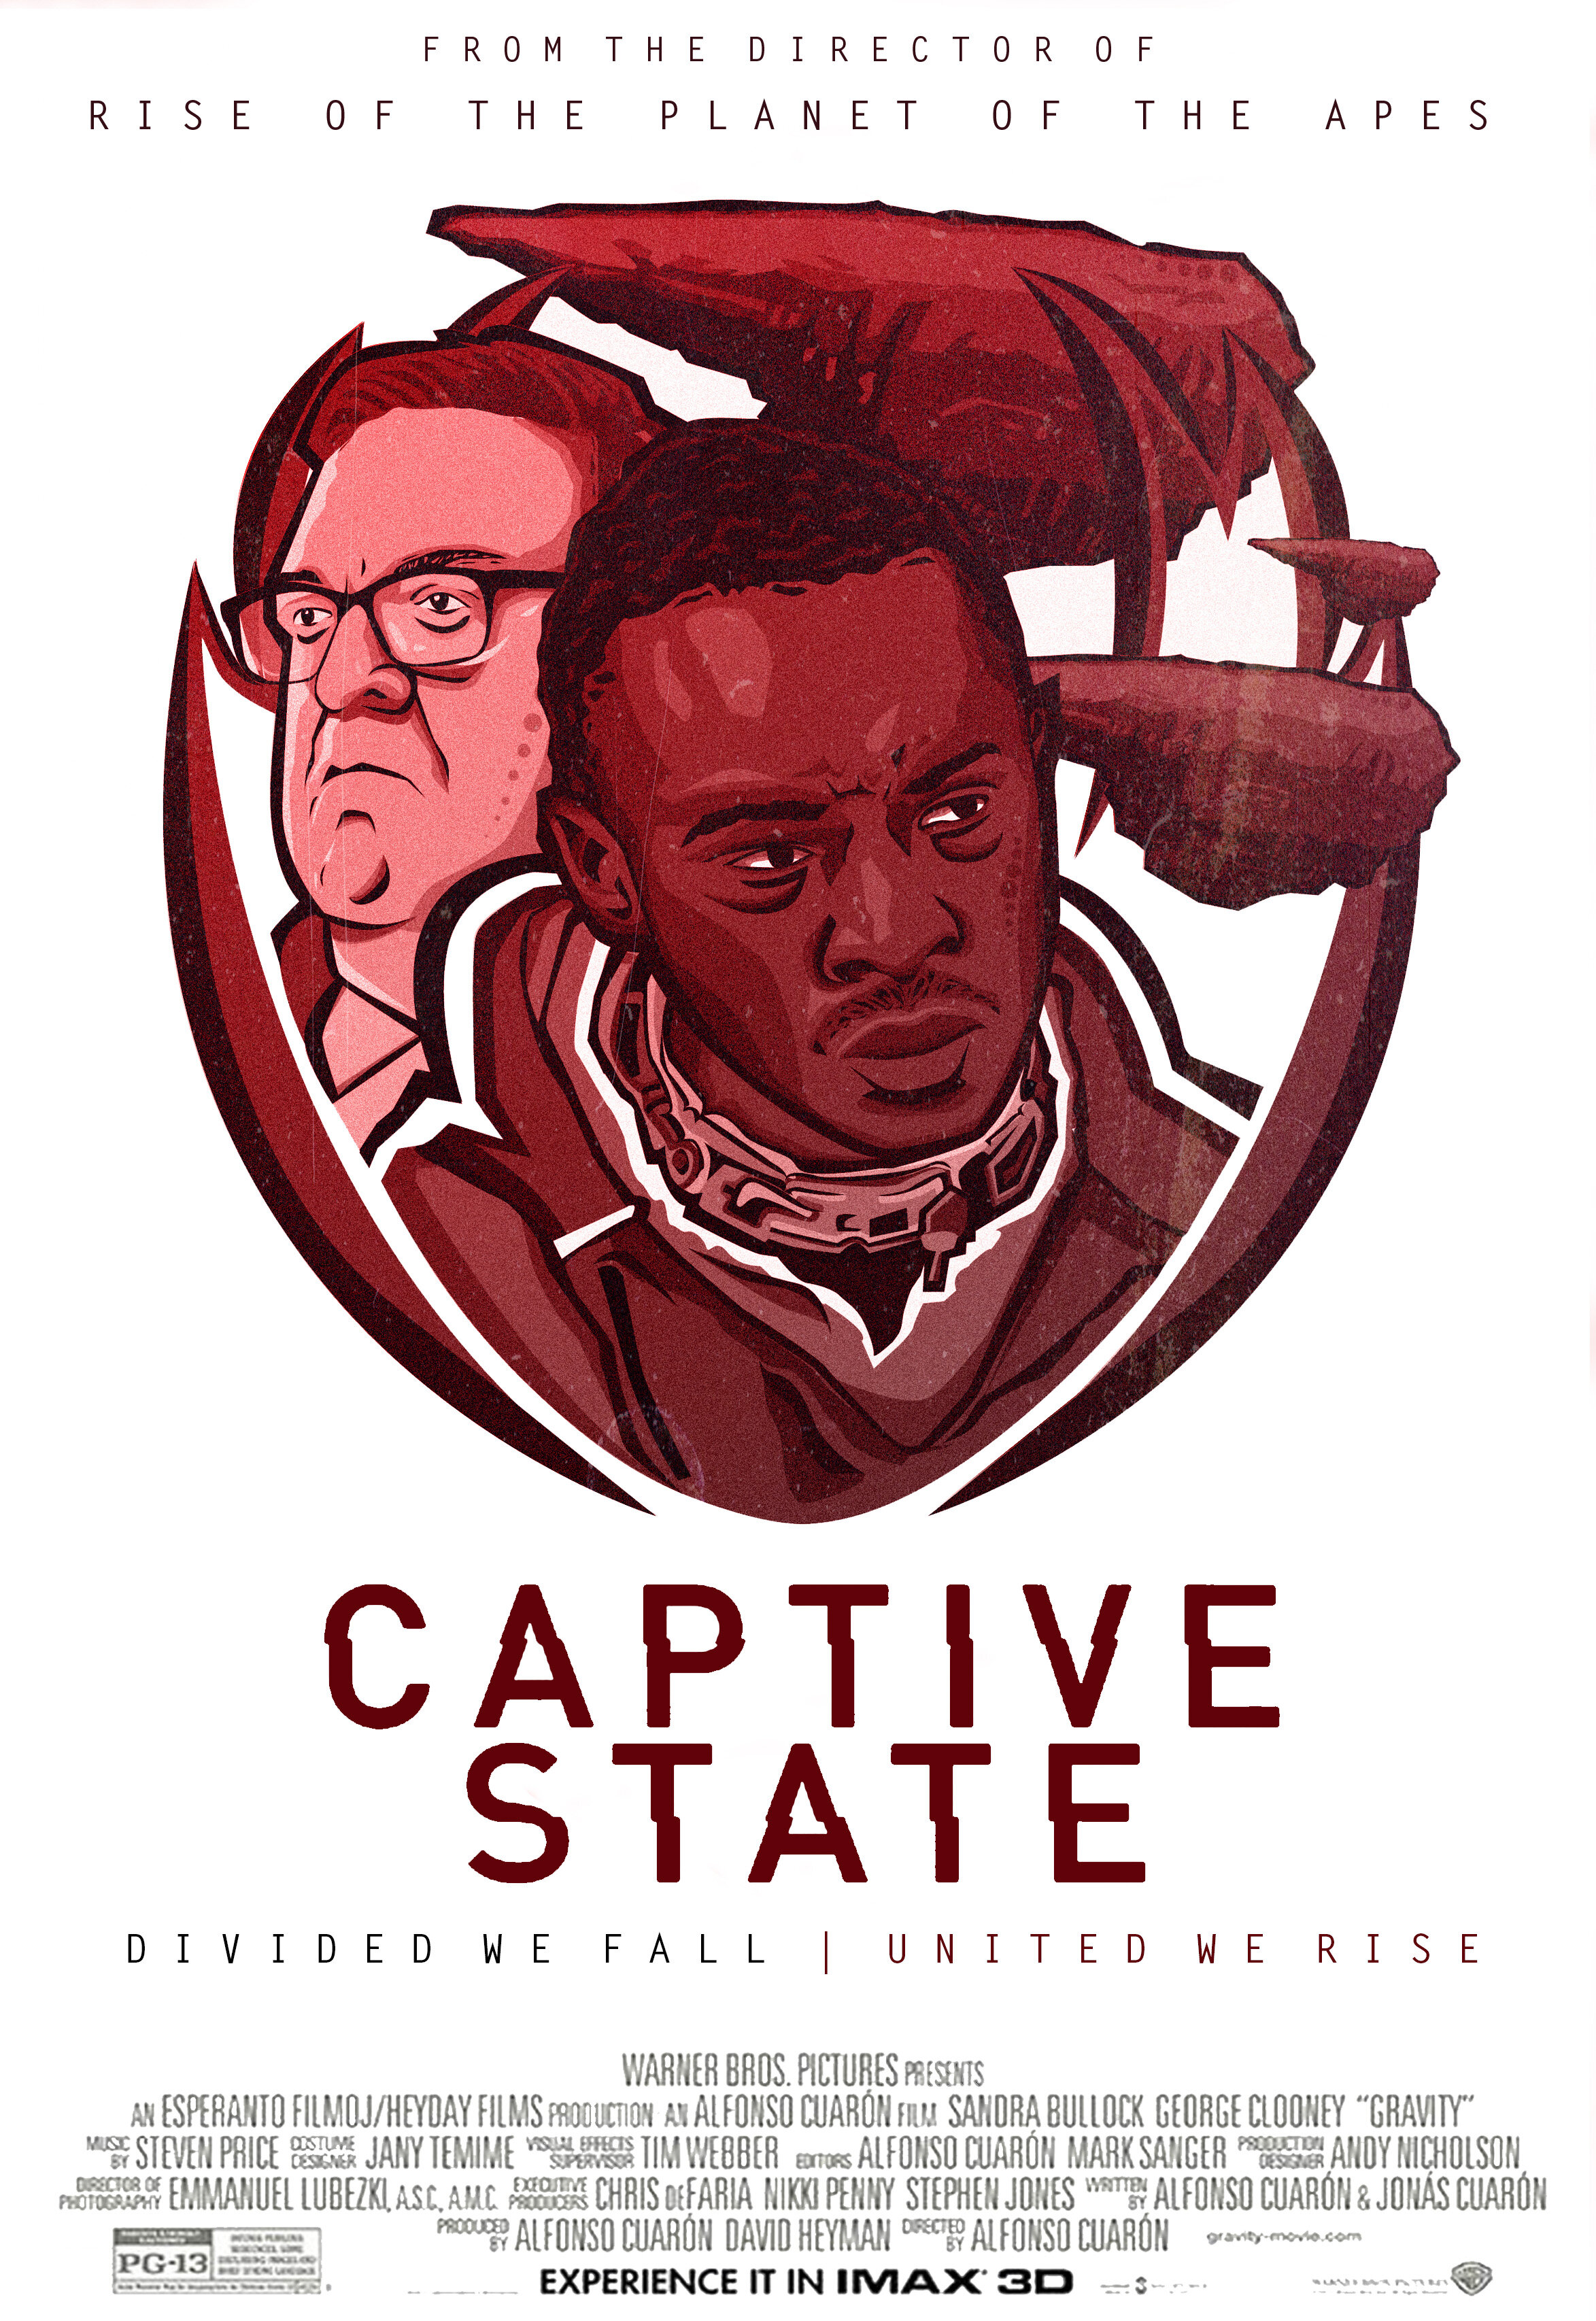 CAPTIVE STATE (FILM VERSION).jpg